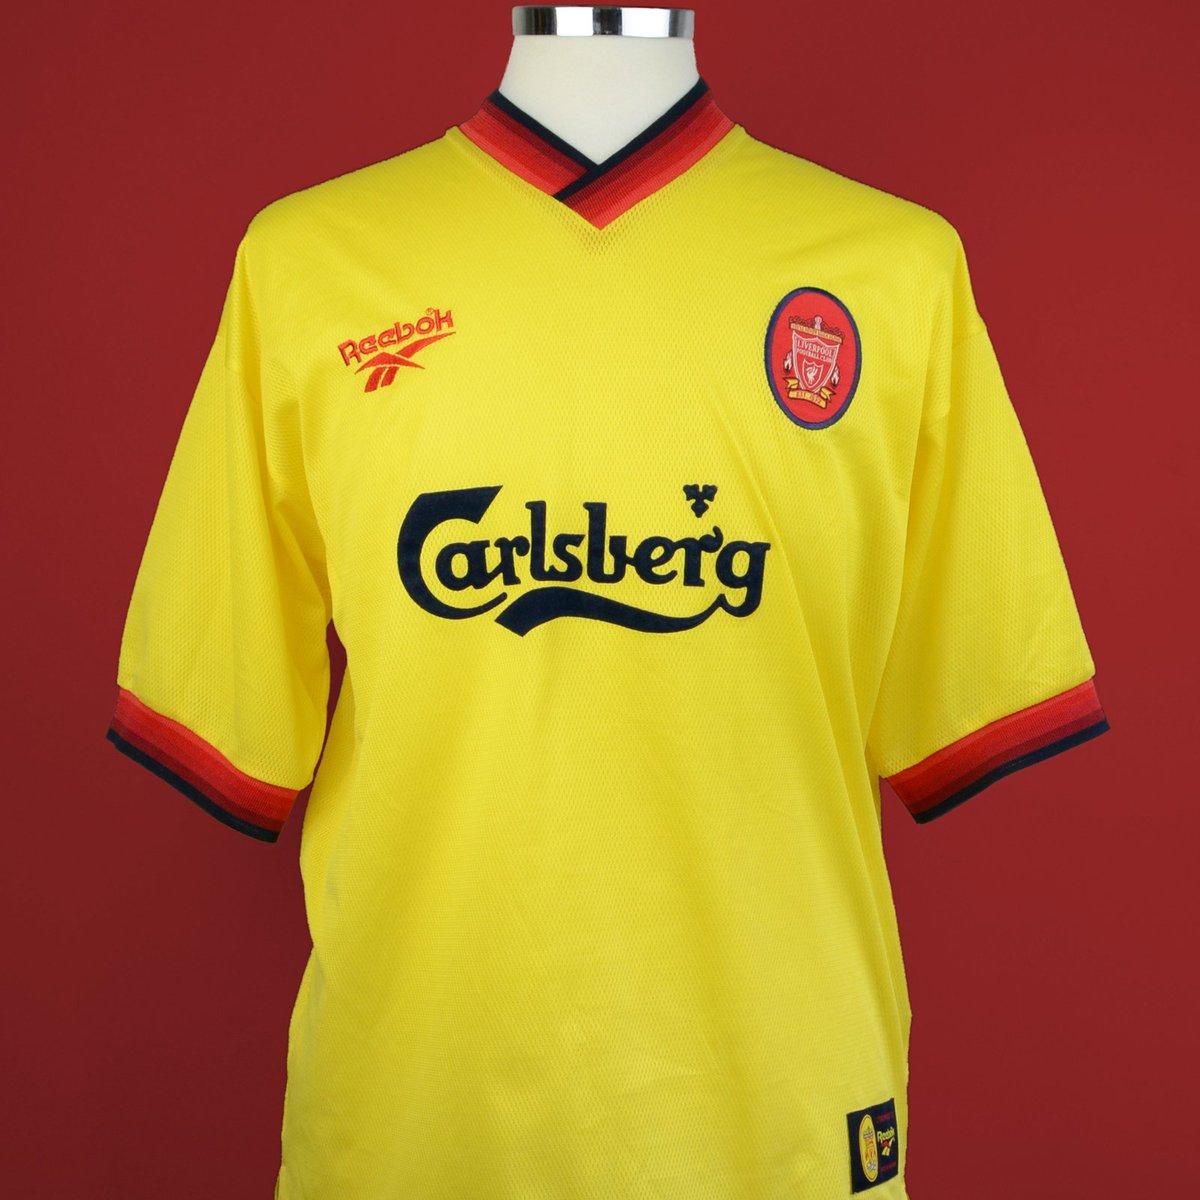 the best attitude 25f76 0898b Classic Football Shirts on Twitter: